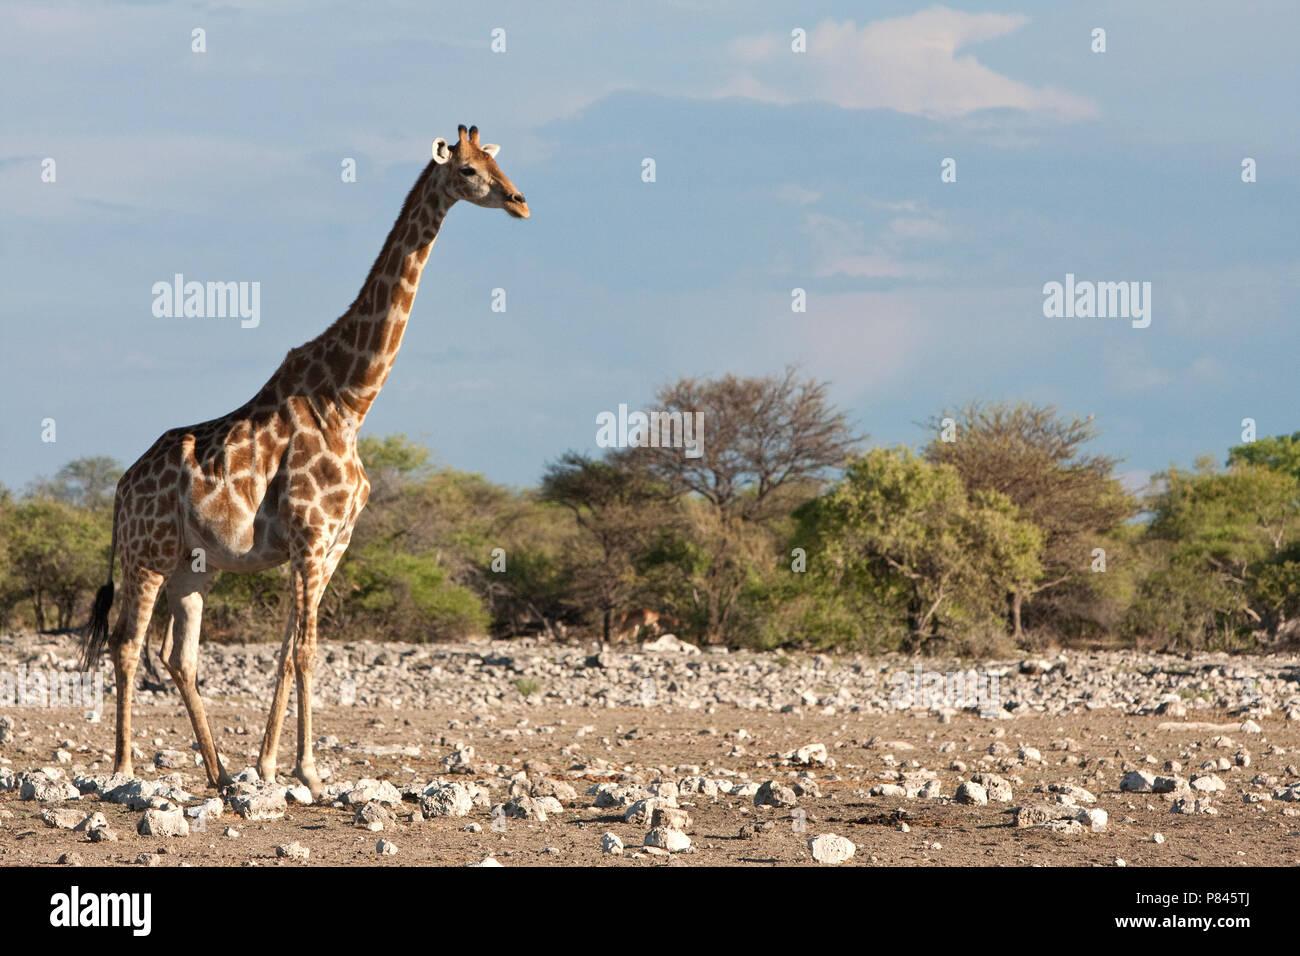 Giraf in Etosha NP Namibie, Giraffe at Etosha NP Namibia - Stock Image